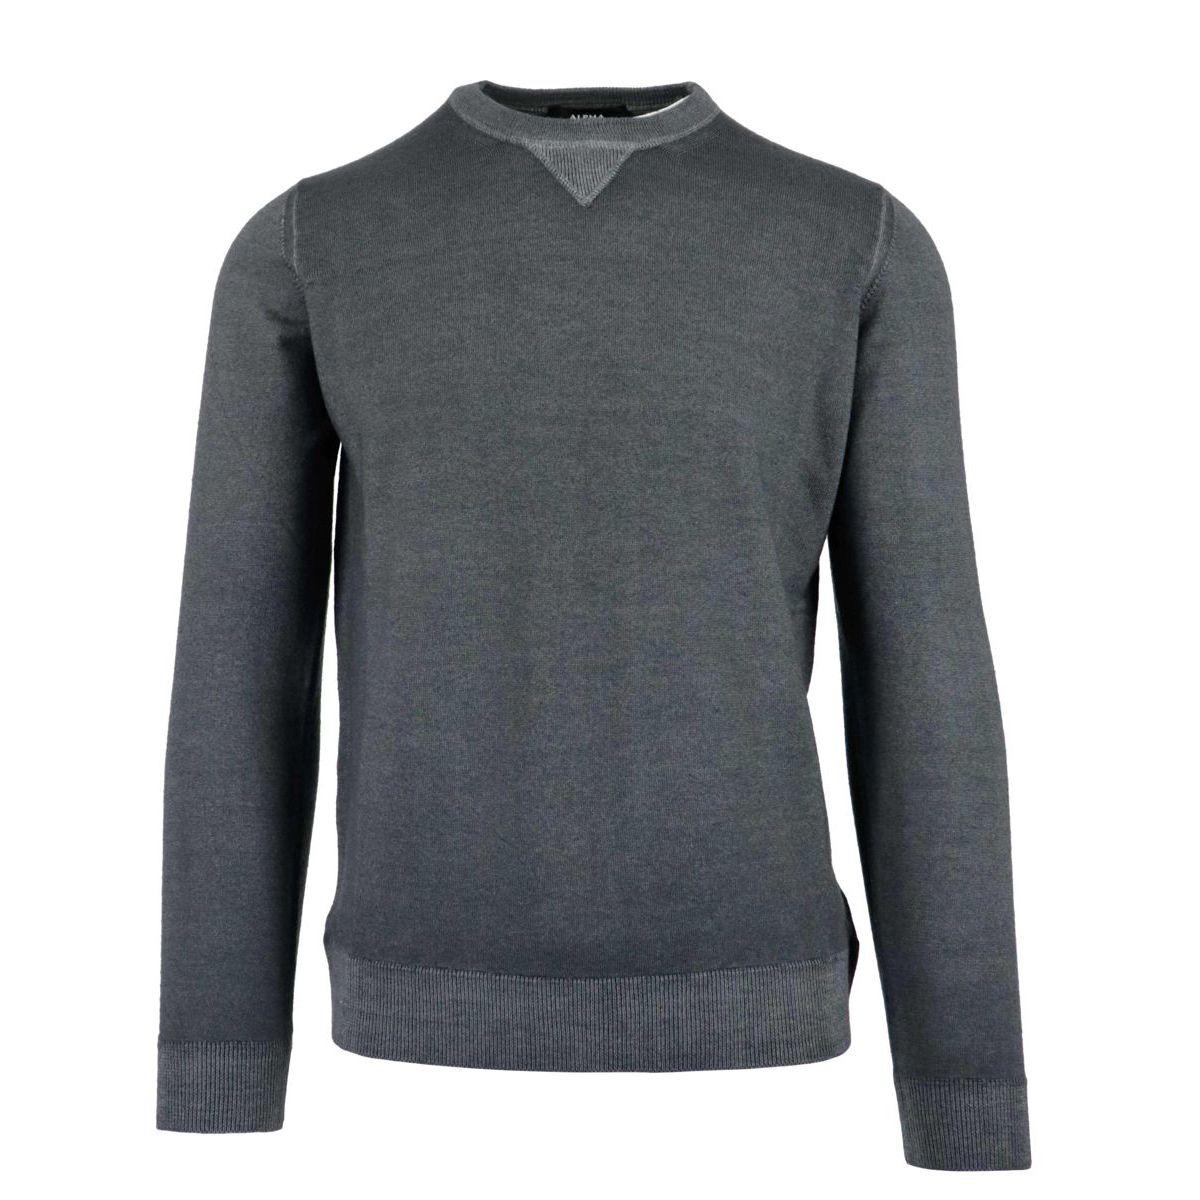 Sweatshirt in washed mohair wool Asphalt Alpha Studio